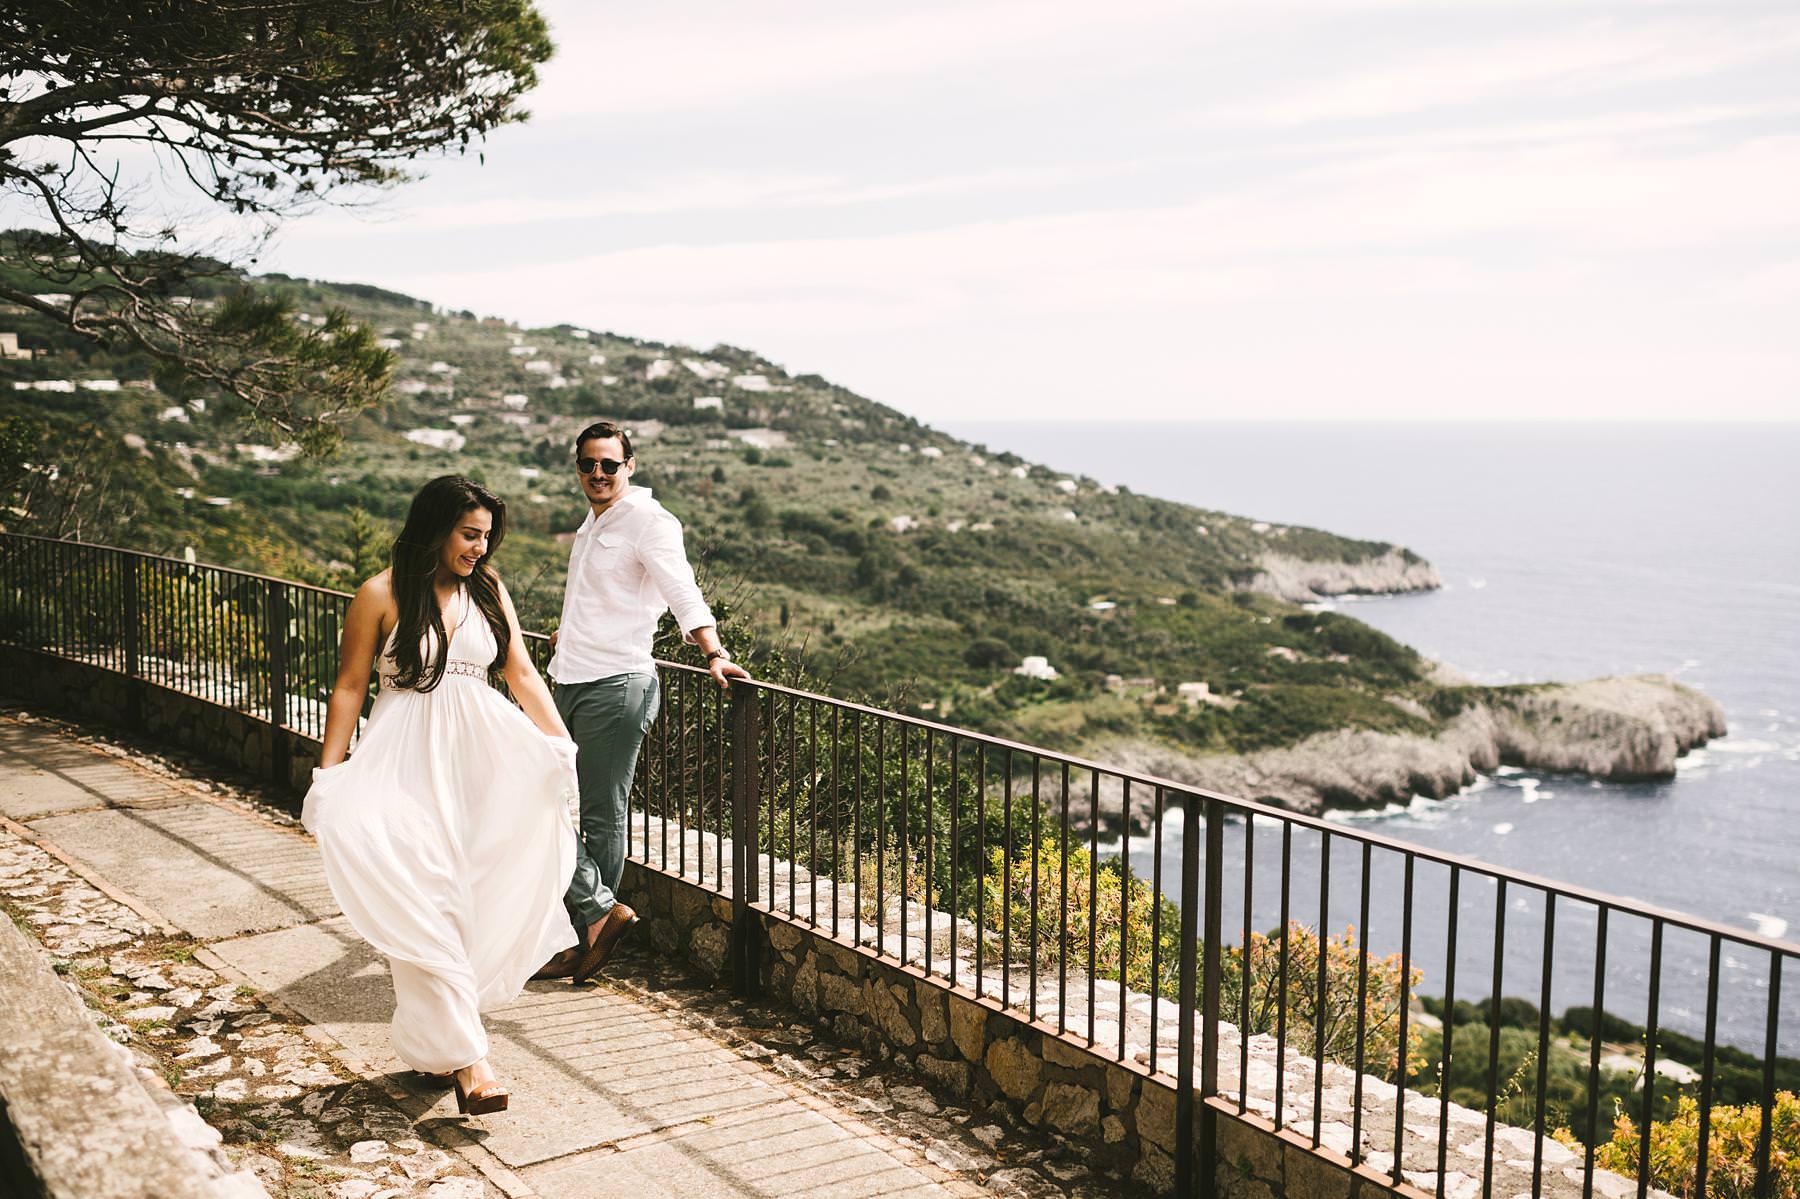 Intimate and romantic couple portrait engagement pre-wedding photo shoot in Capri